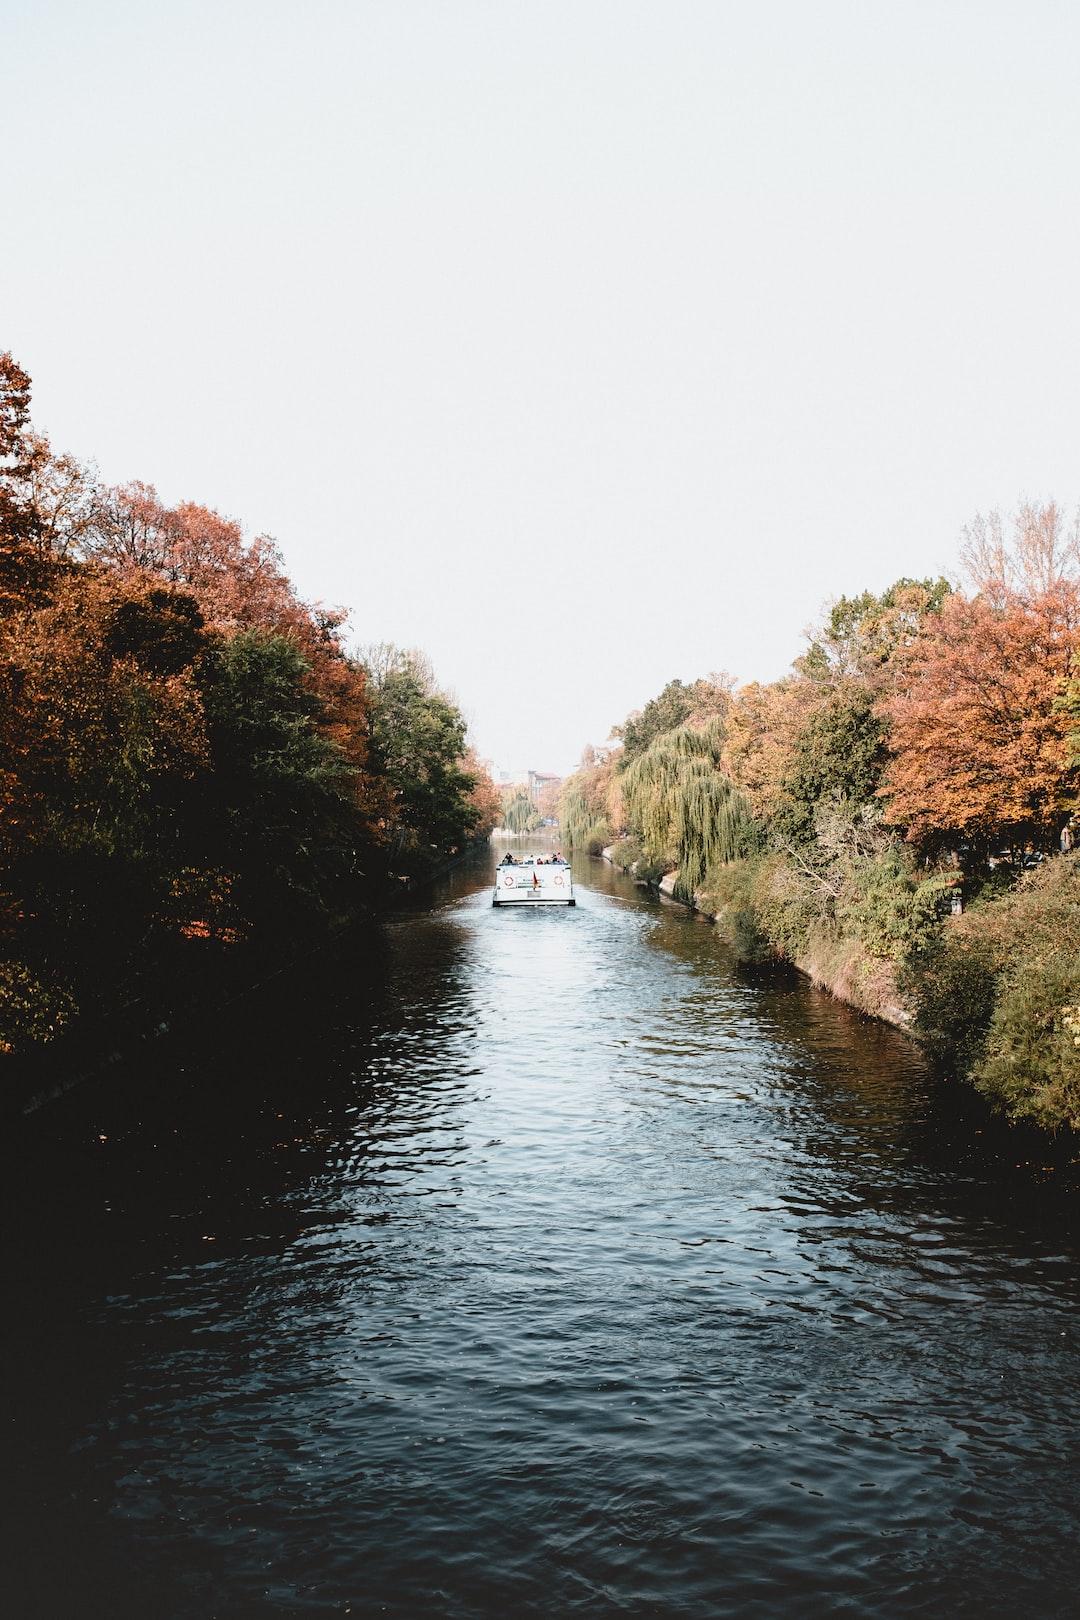 Lanwehr Canal, Berlin